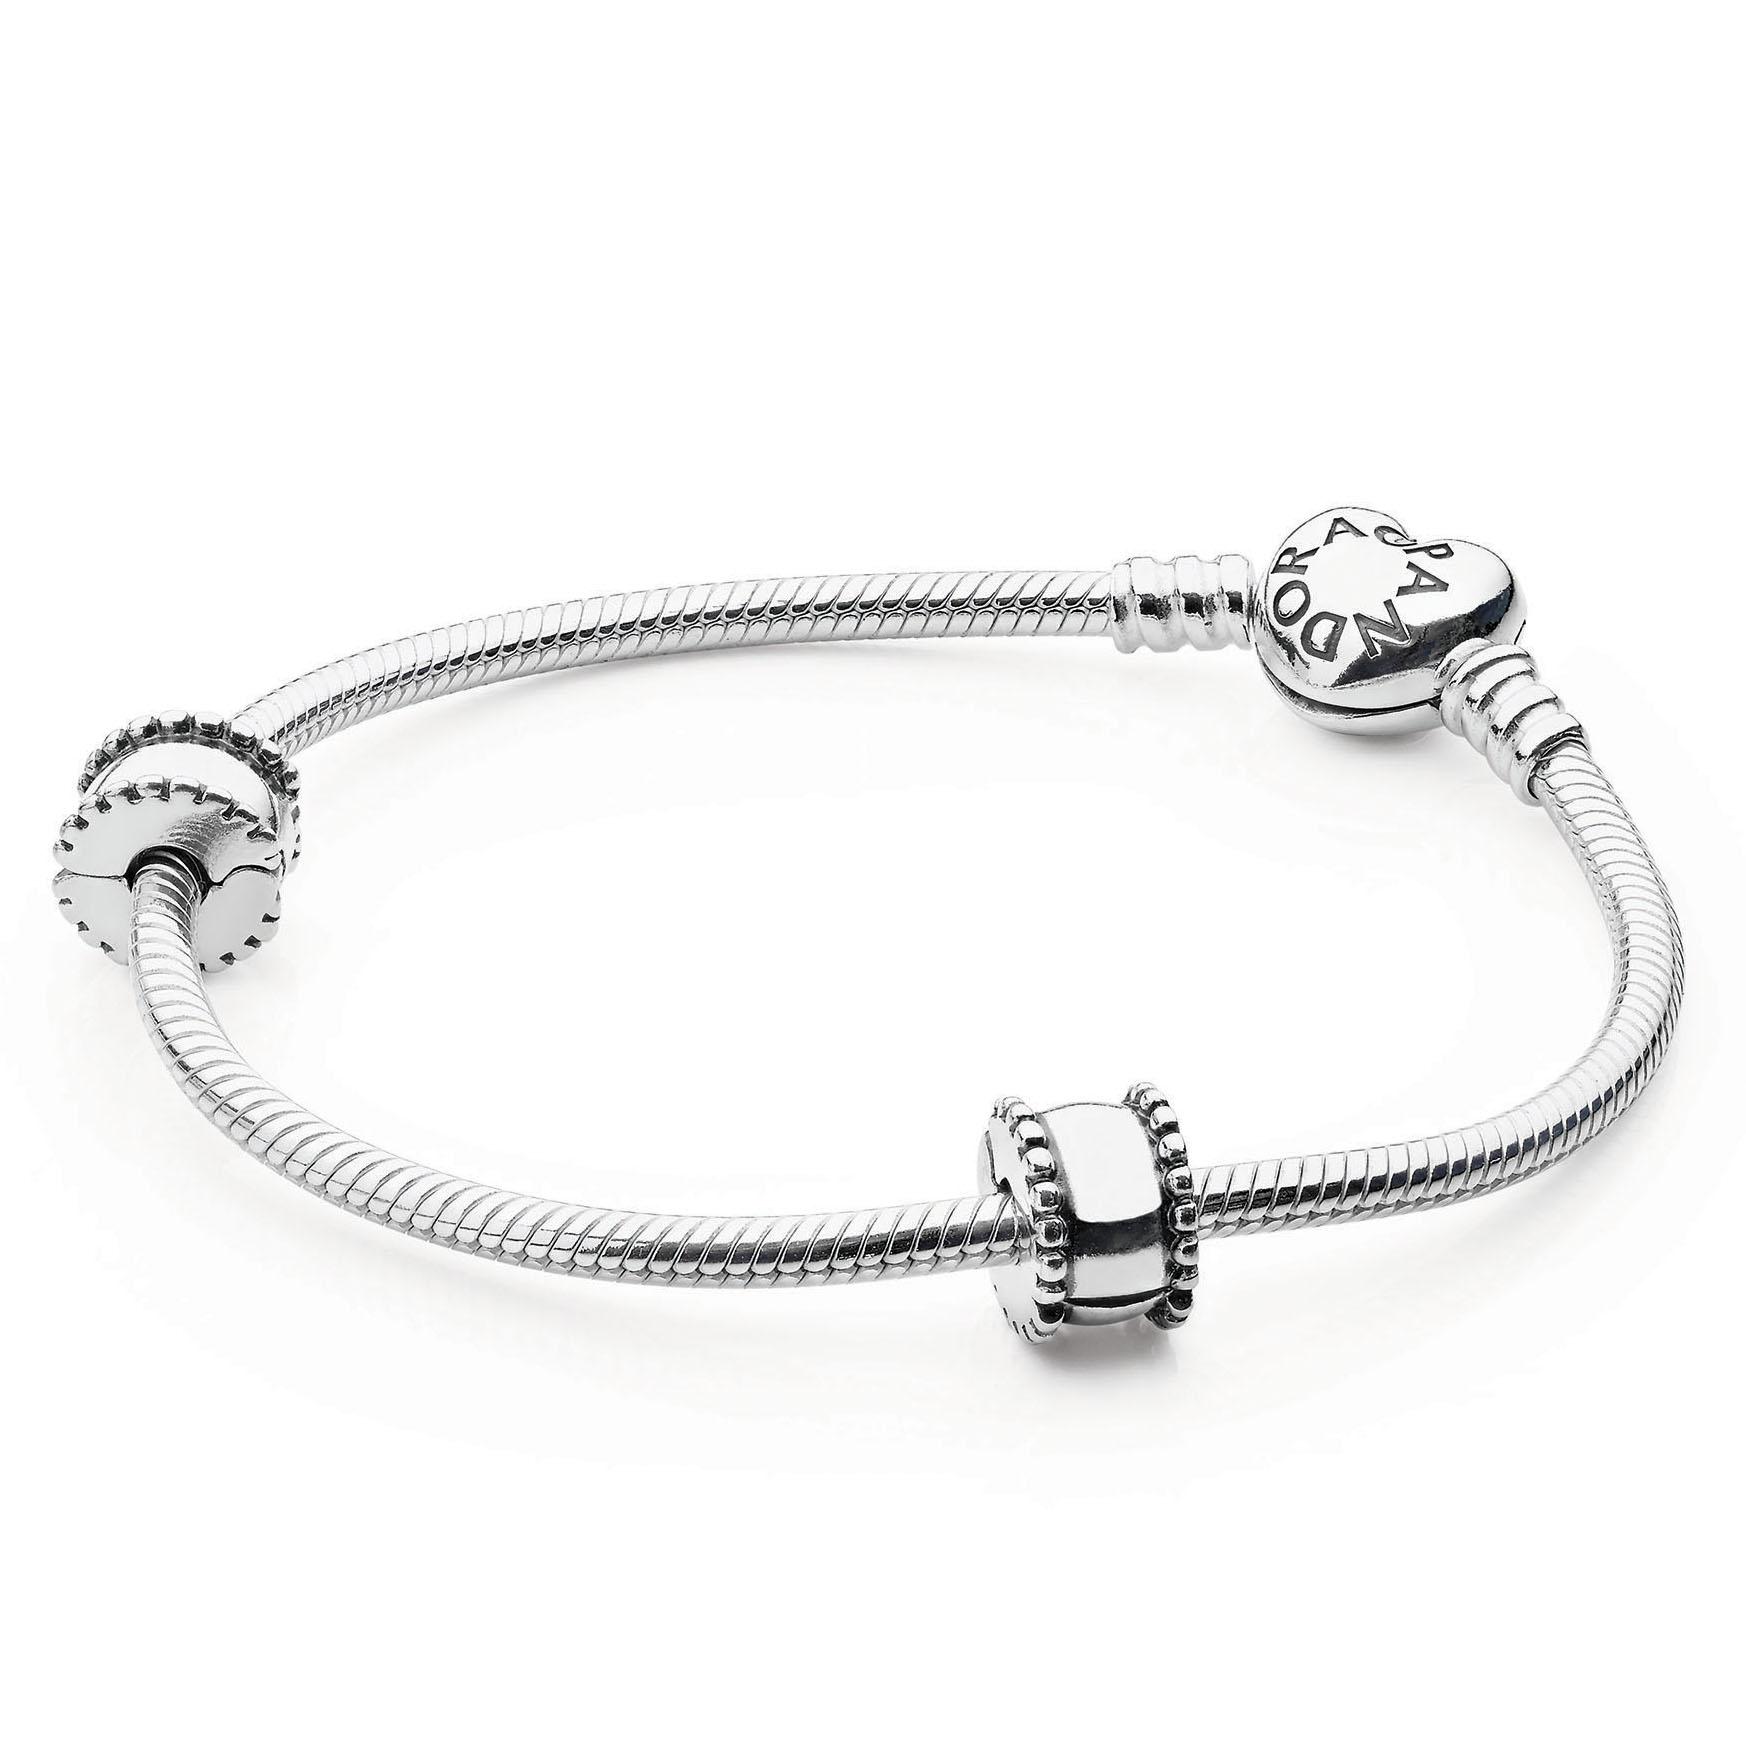 5d0632568 PANDORA Iconic Heart Bracelet Gift Set - Pancharmbracelets.com